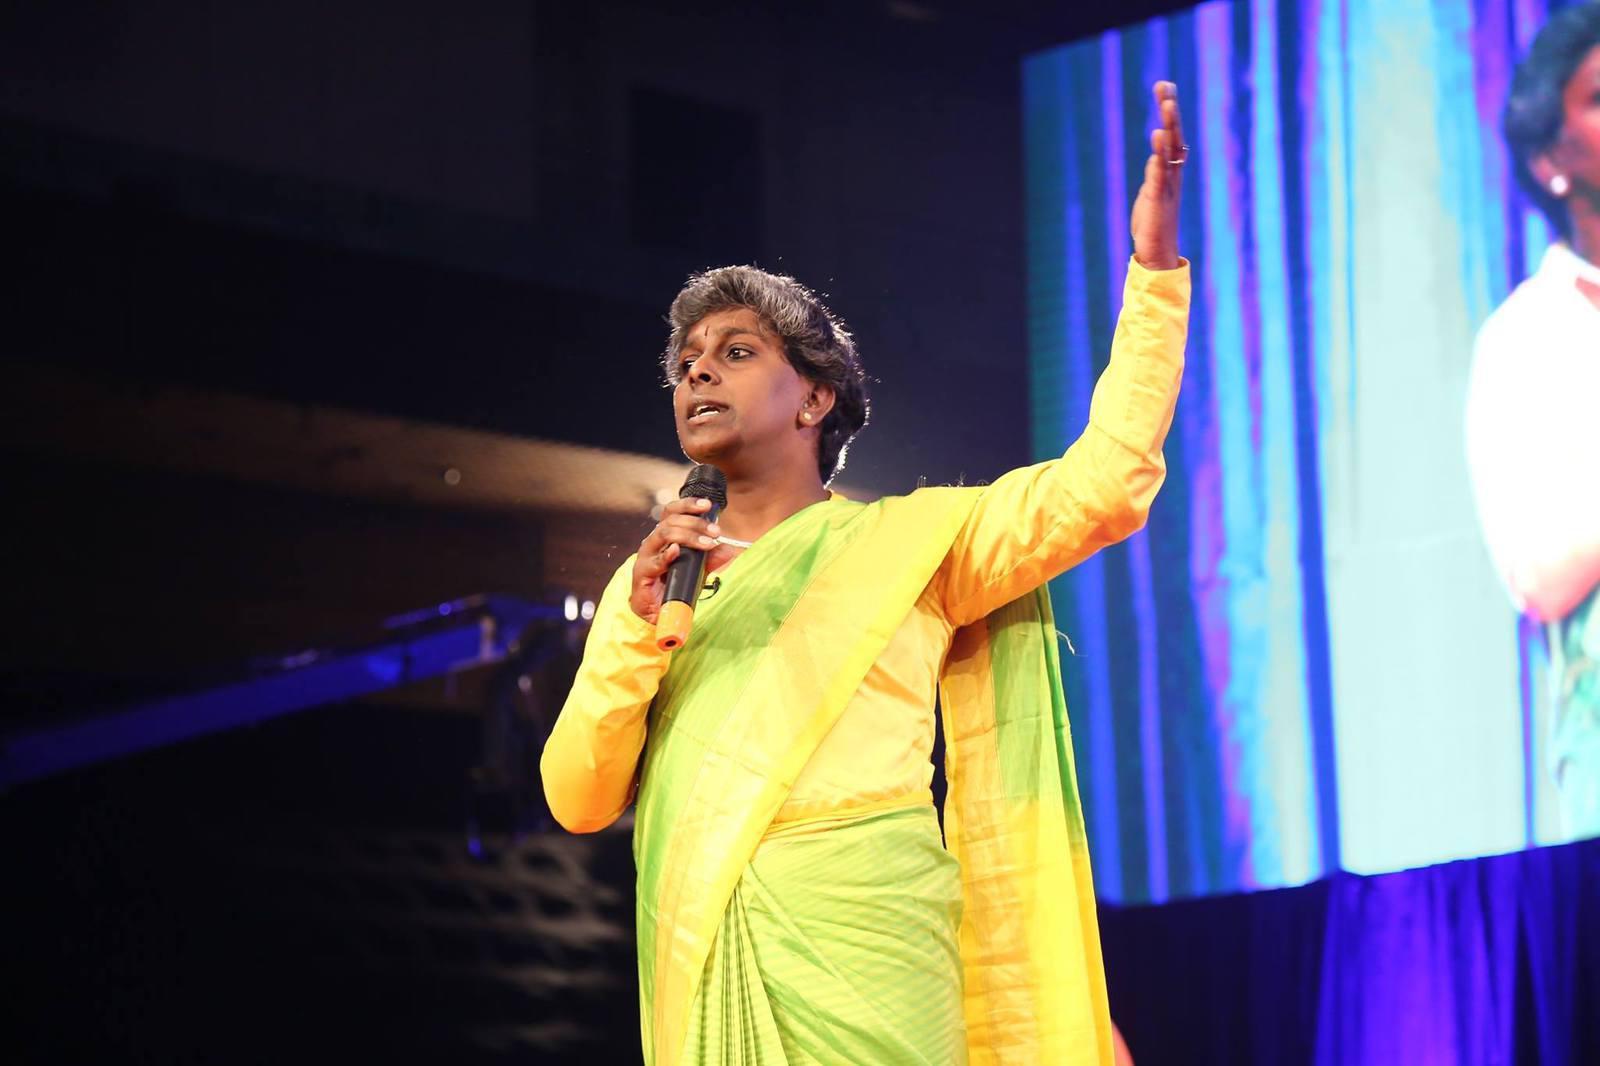 #4 An Indian transgender asks an uncomfortable question | Akkai Padmashali